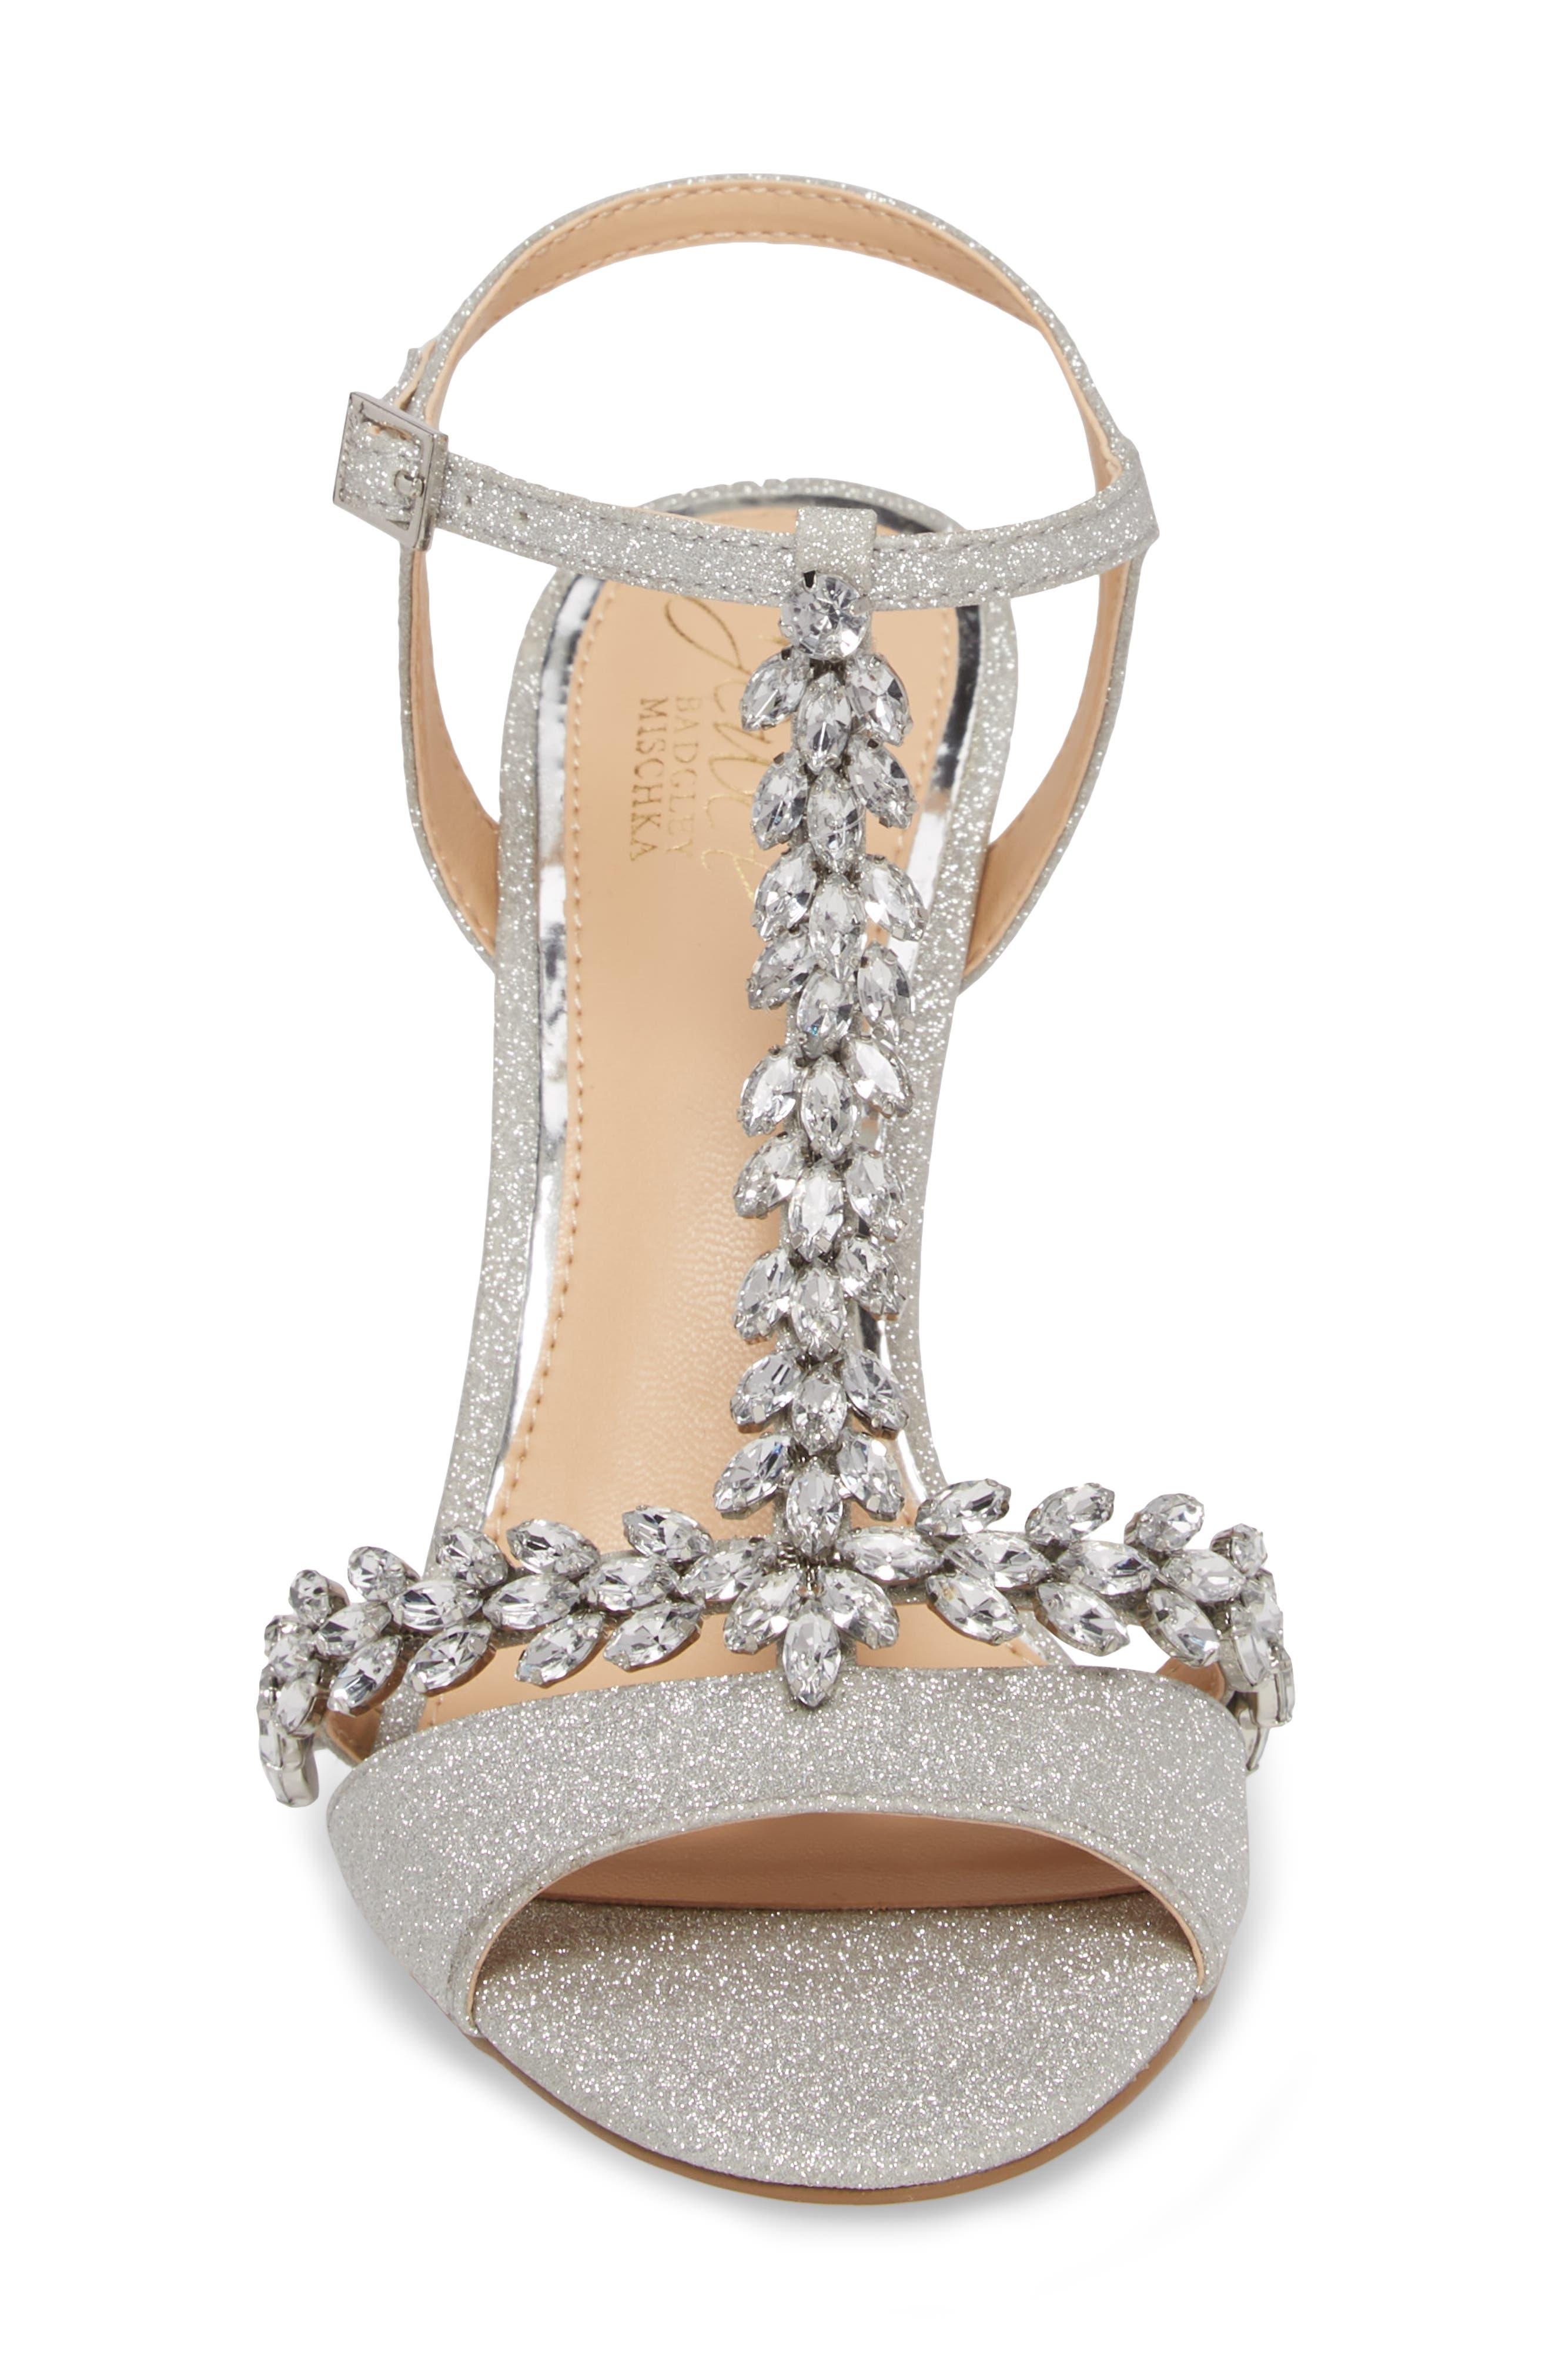 JEWEL BADGLEY MISCHKA, Maxi Crystal Embellished Sandal, Alternate thumbnail 4, color, SILVER GLITTER FABRIC